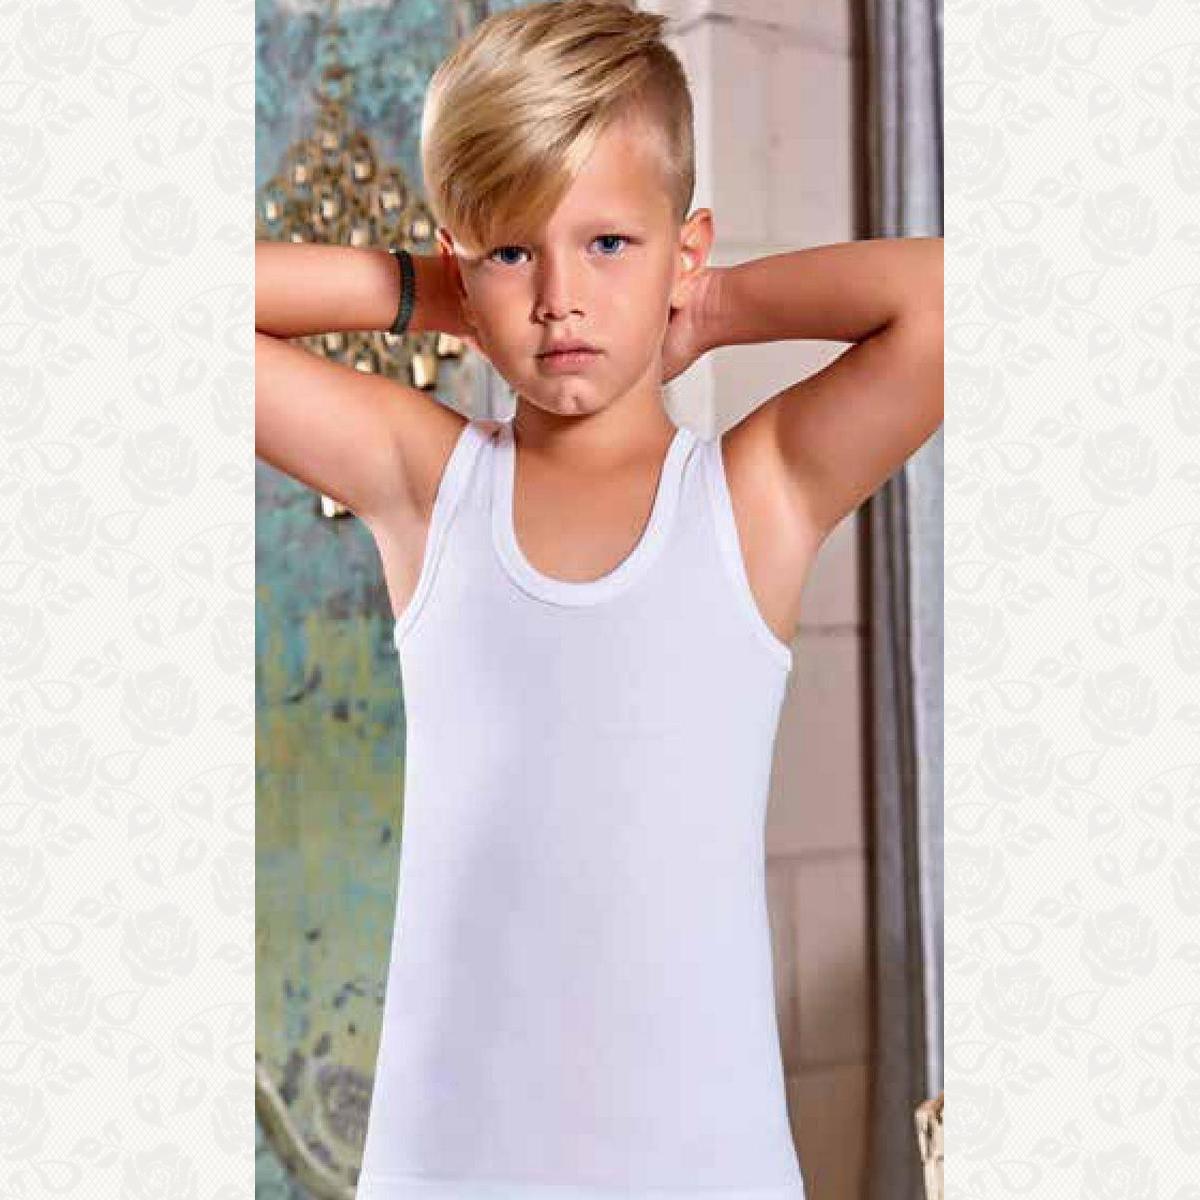 Майка для мальчика размер от 5 до 6, цвет белый, 6 шт.